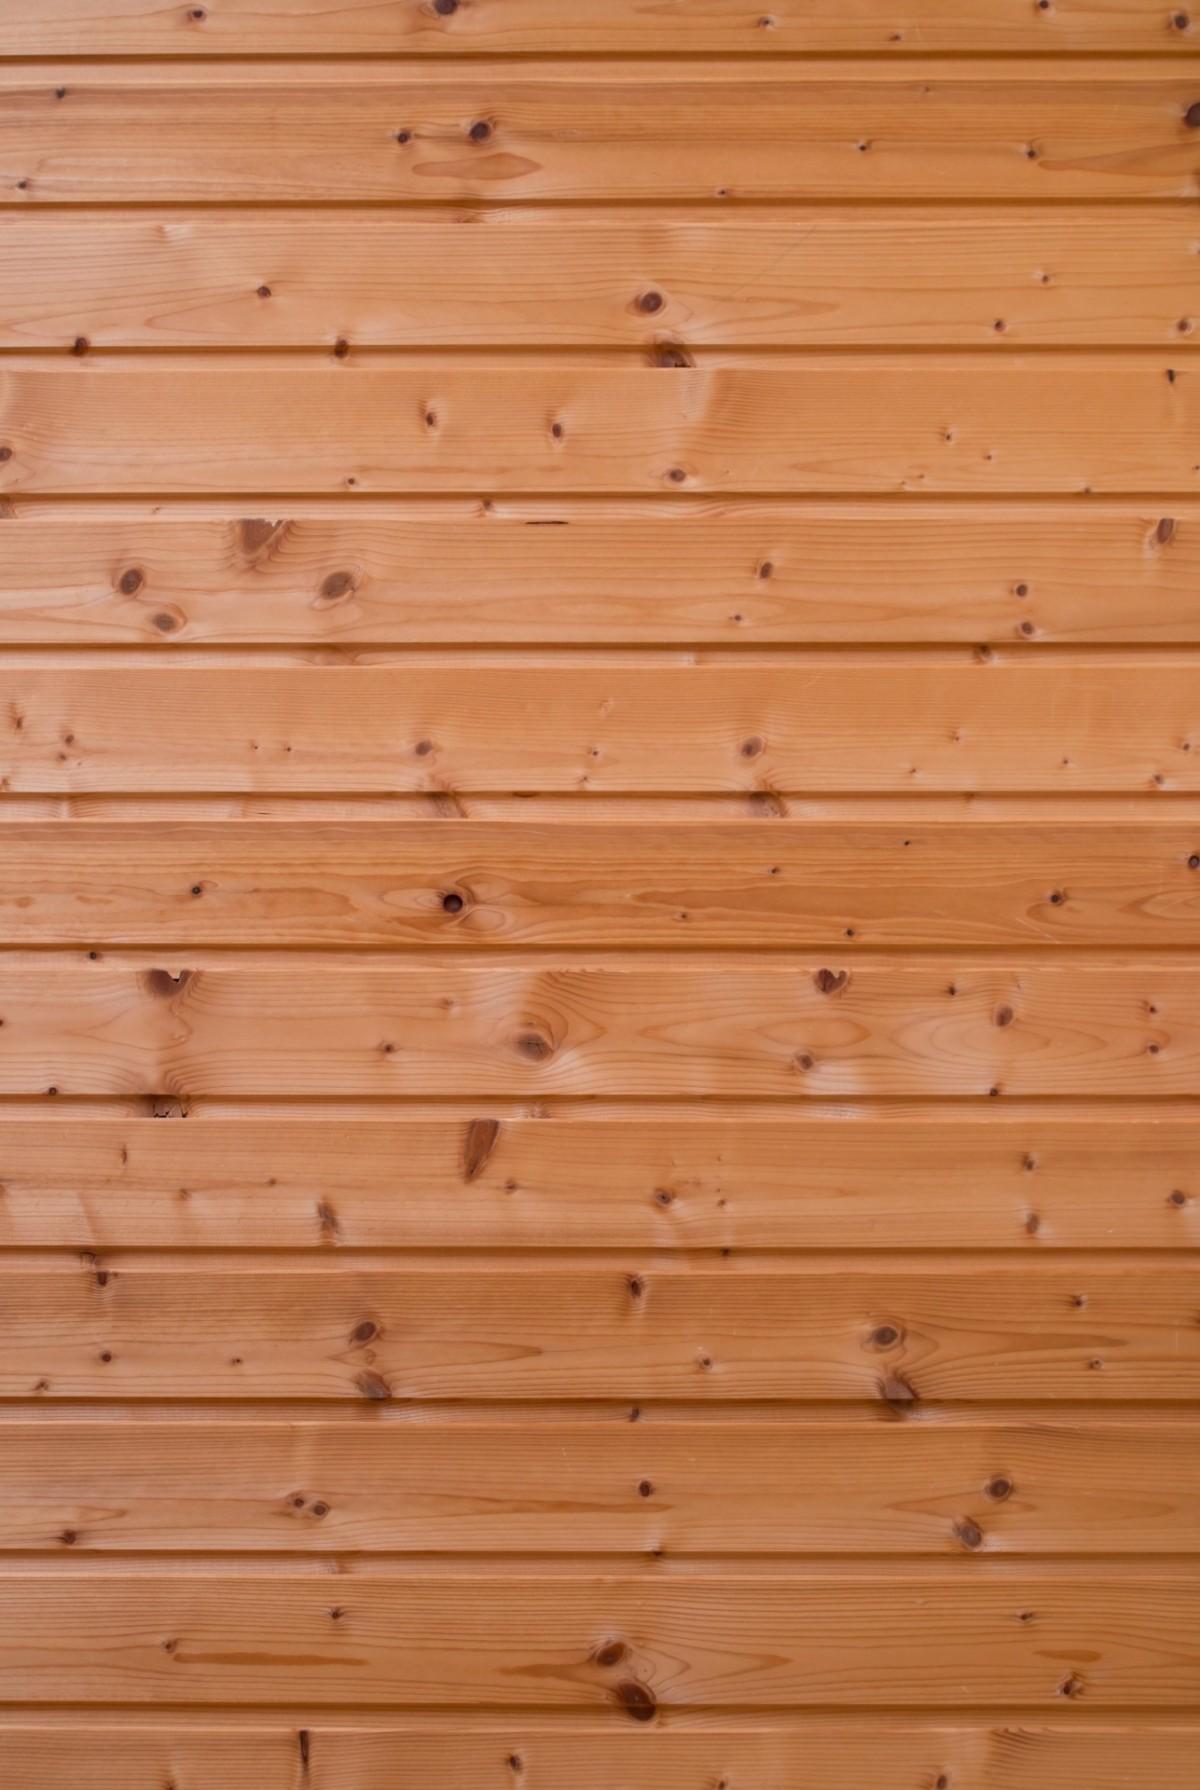 gambar papan lantai jendela coklat pintu desain interior kayu keras dinding kayu. Black Bedroom Furniture Sets. Home Design Ideas